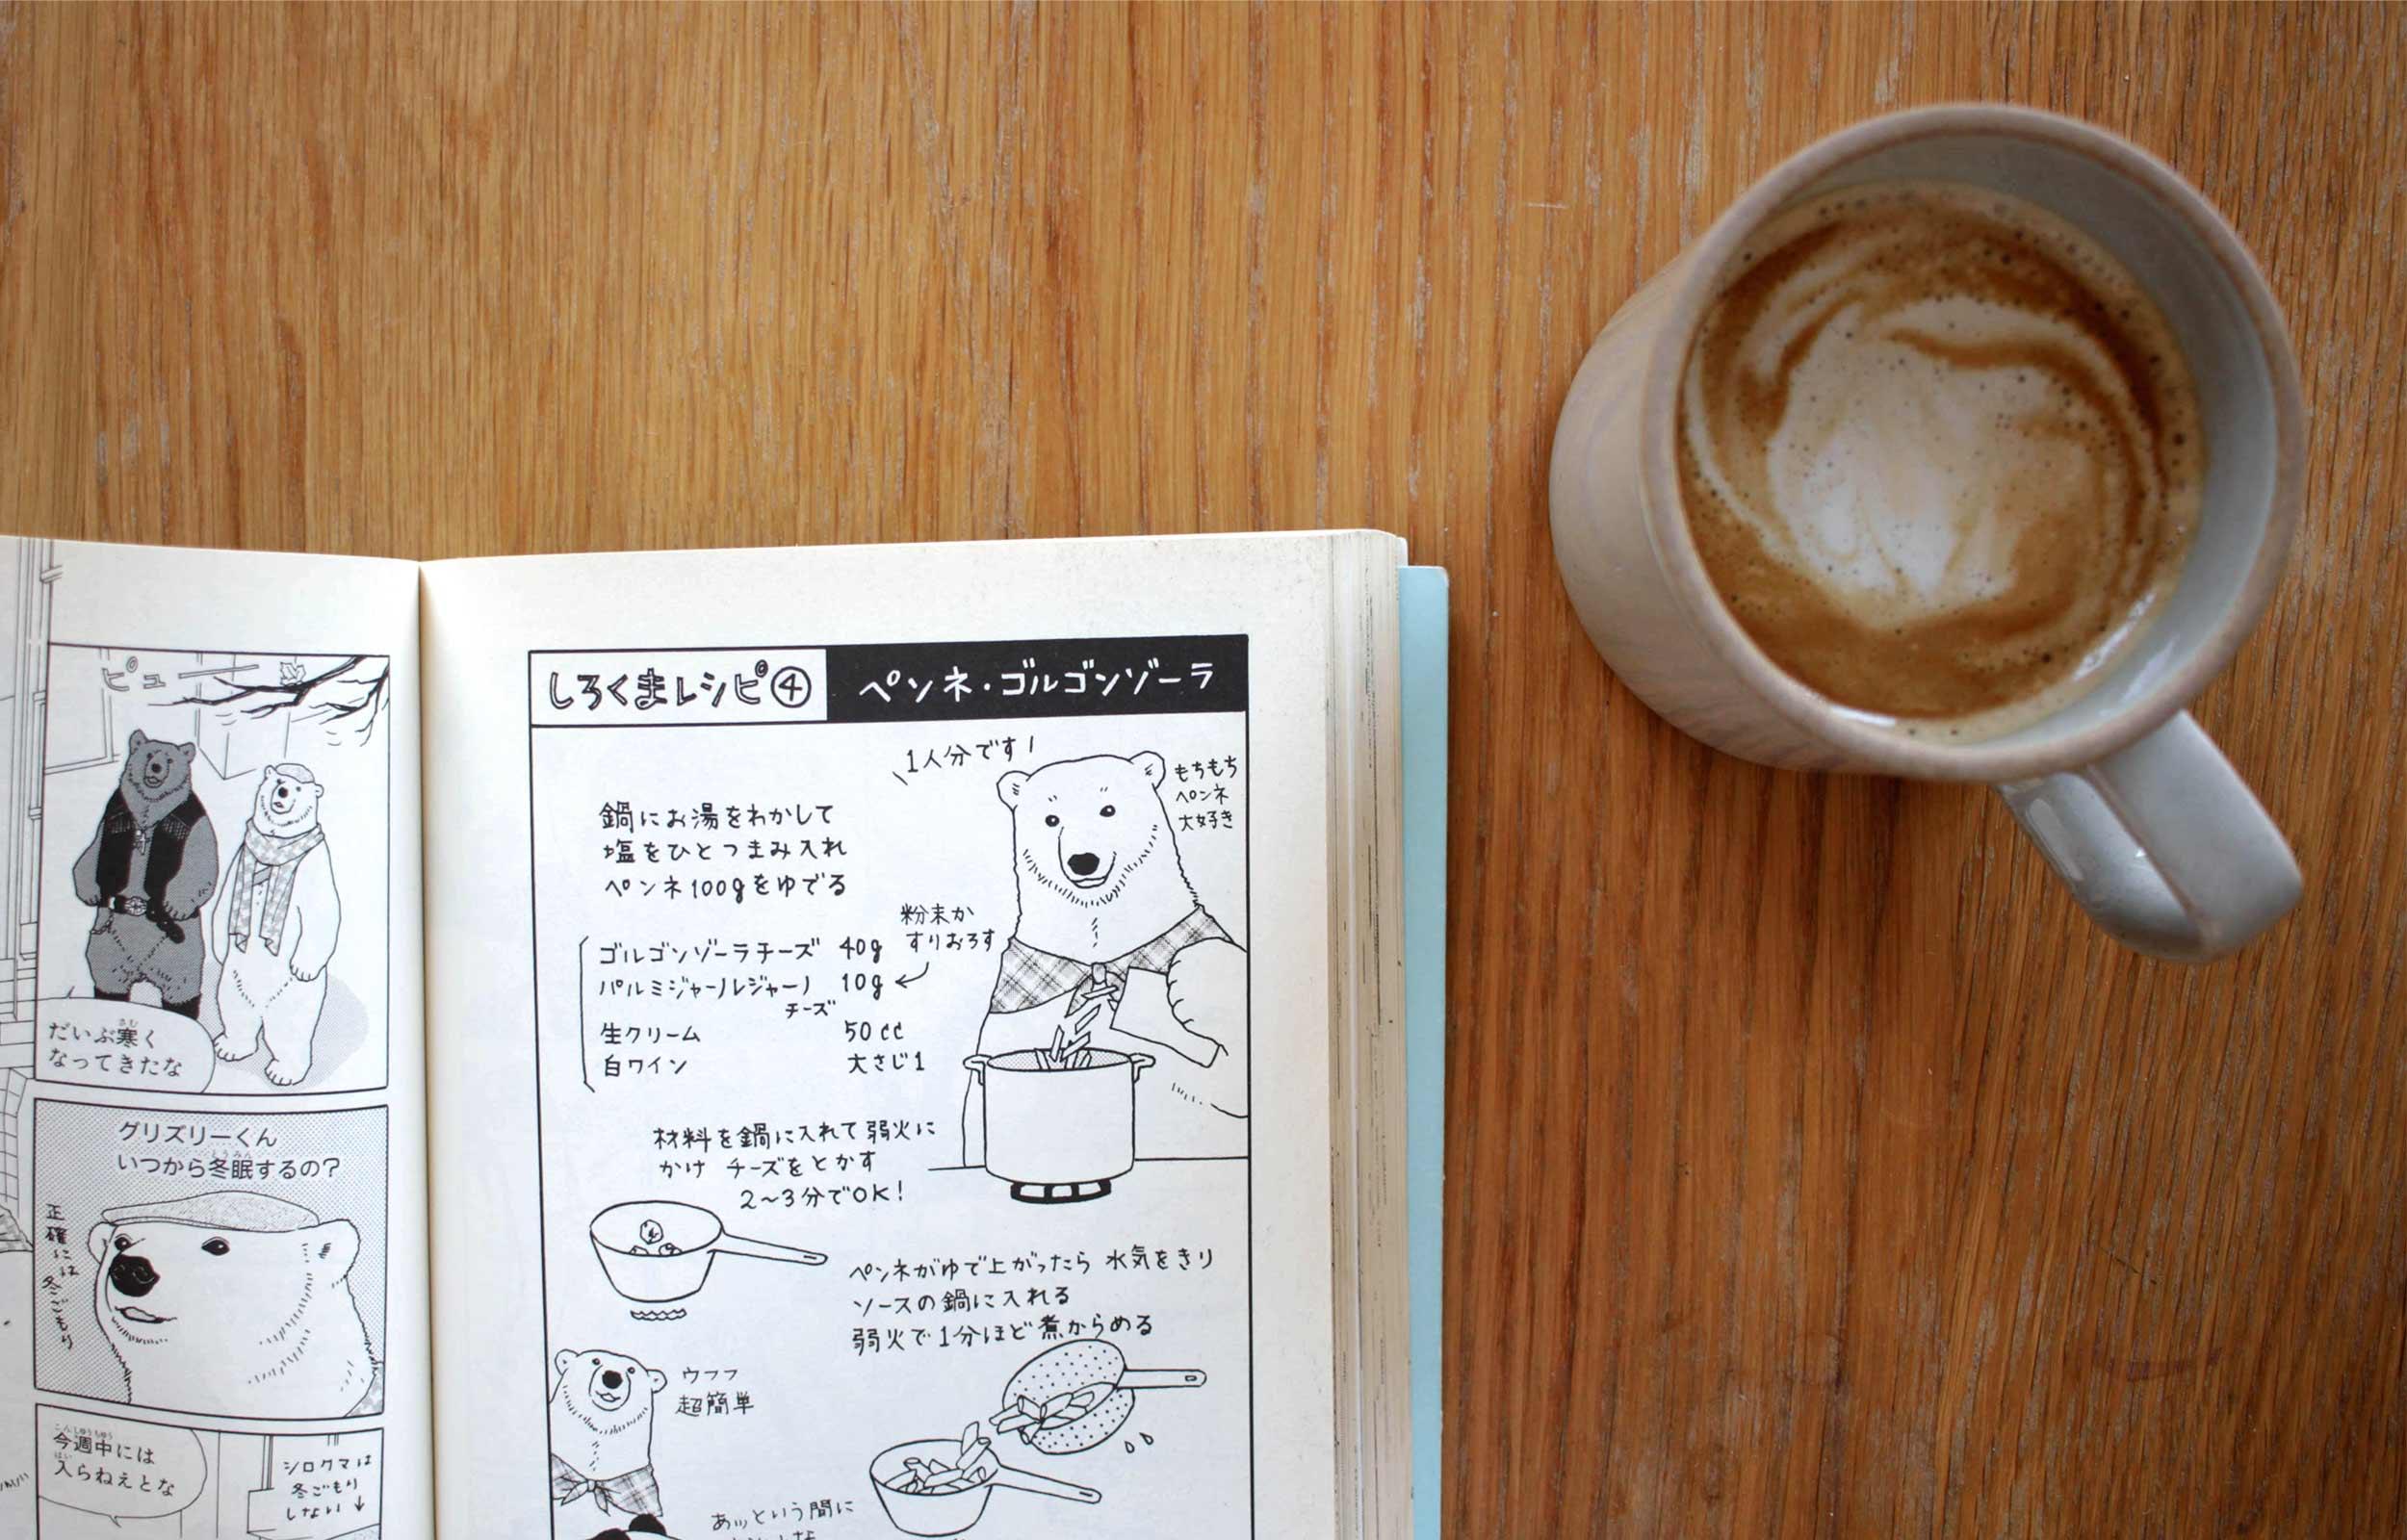 Shirokuma Cafe manga book and a cup of coffee